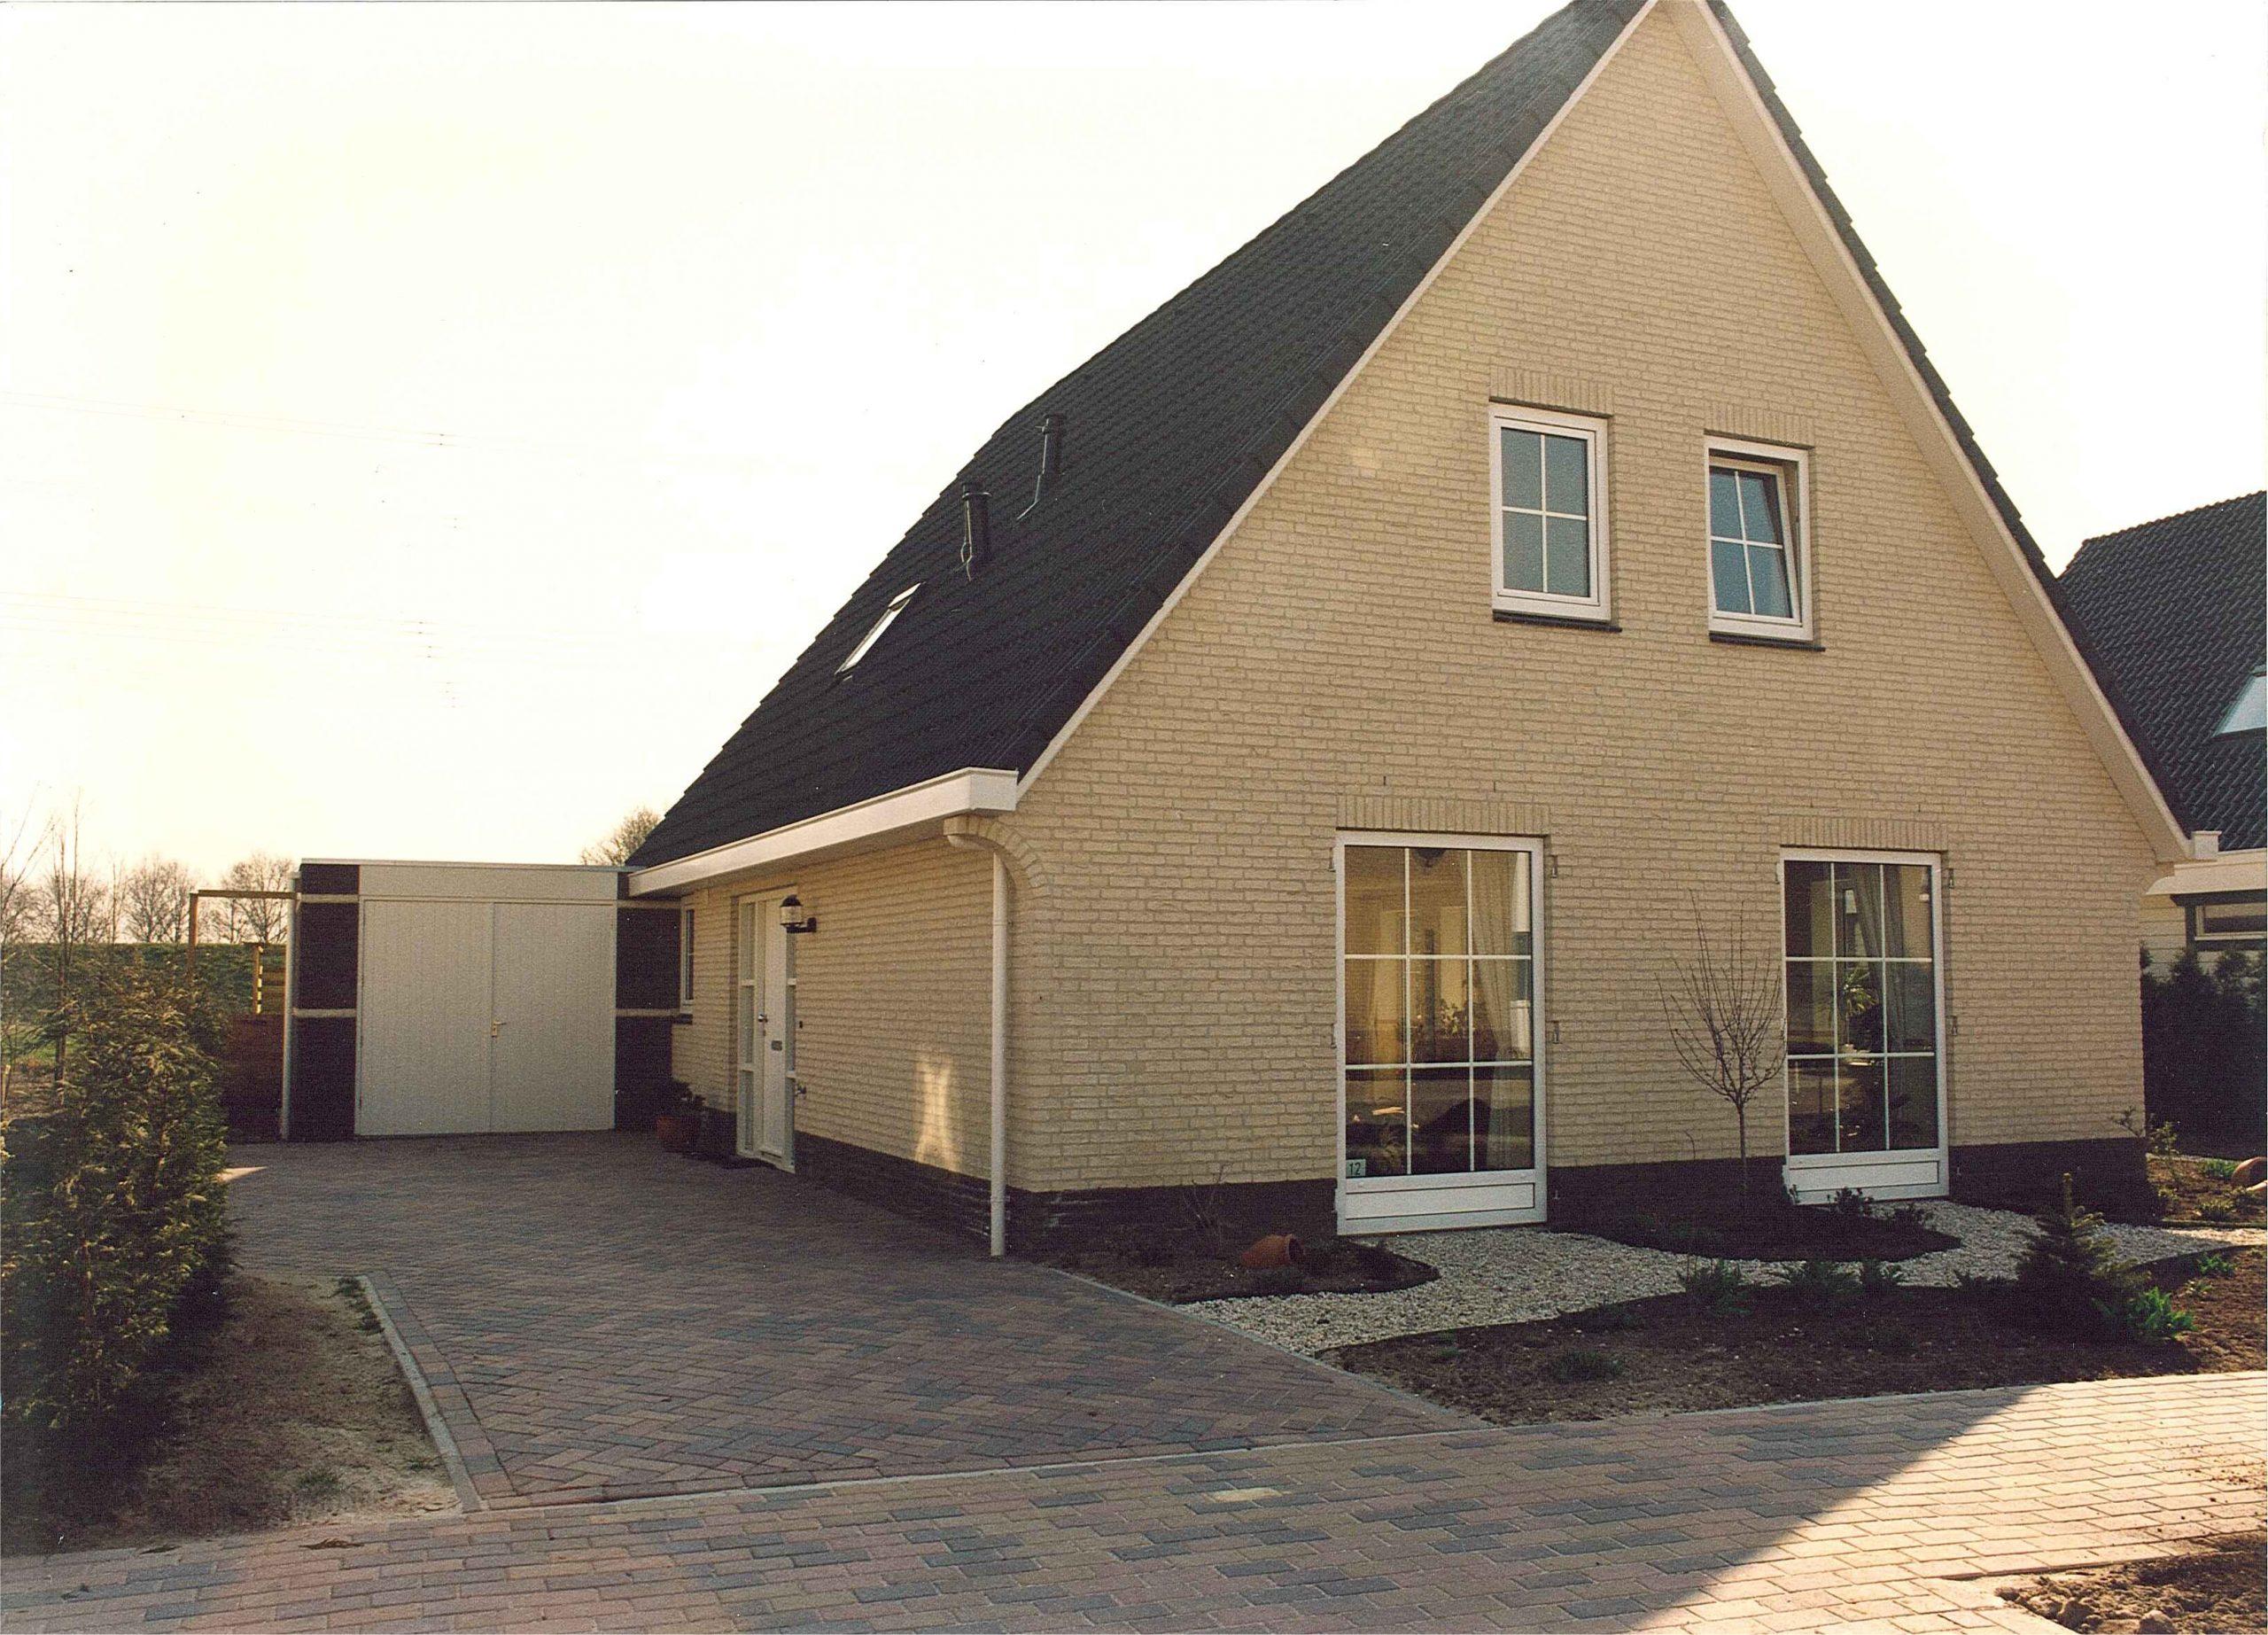 1995_Hogervorst_Venray-1